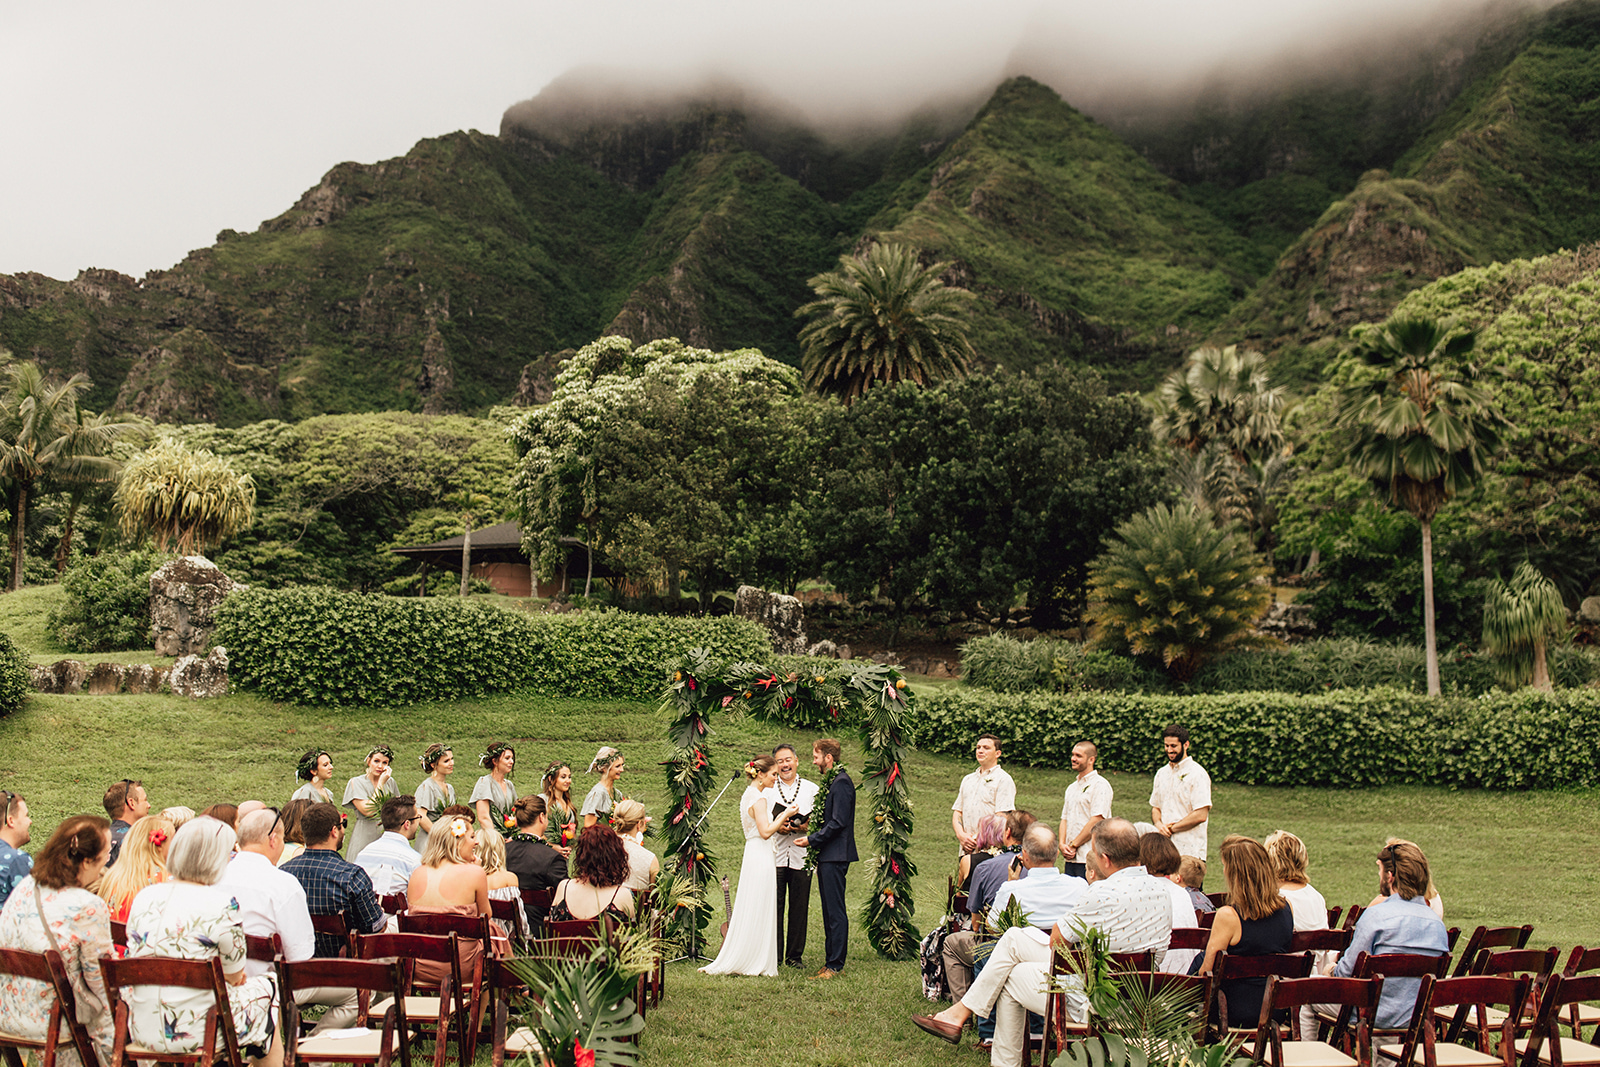 kualoa-ranch-wedding-1-182.jpg